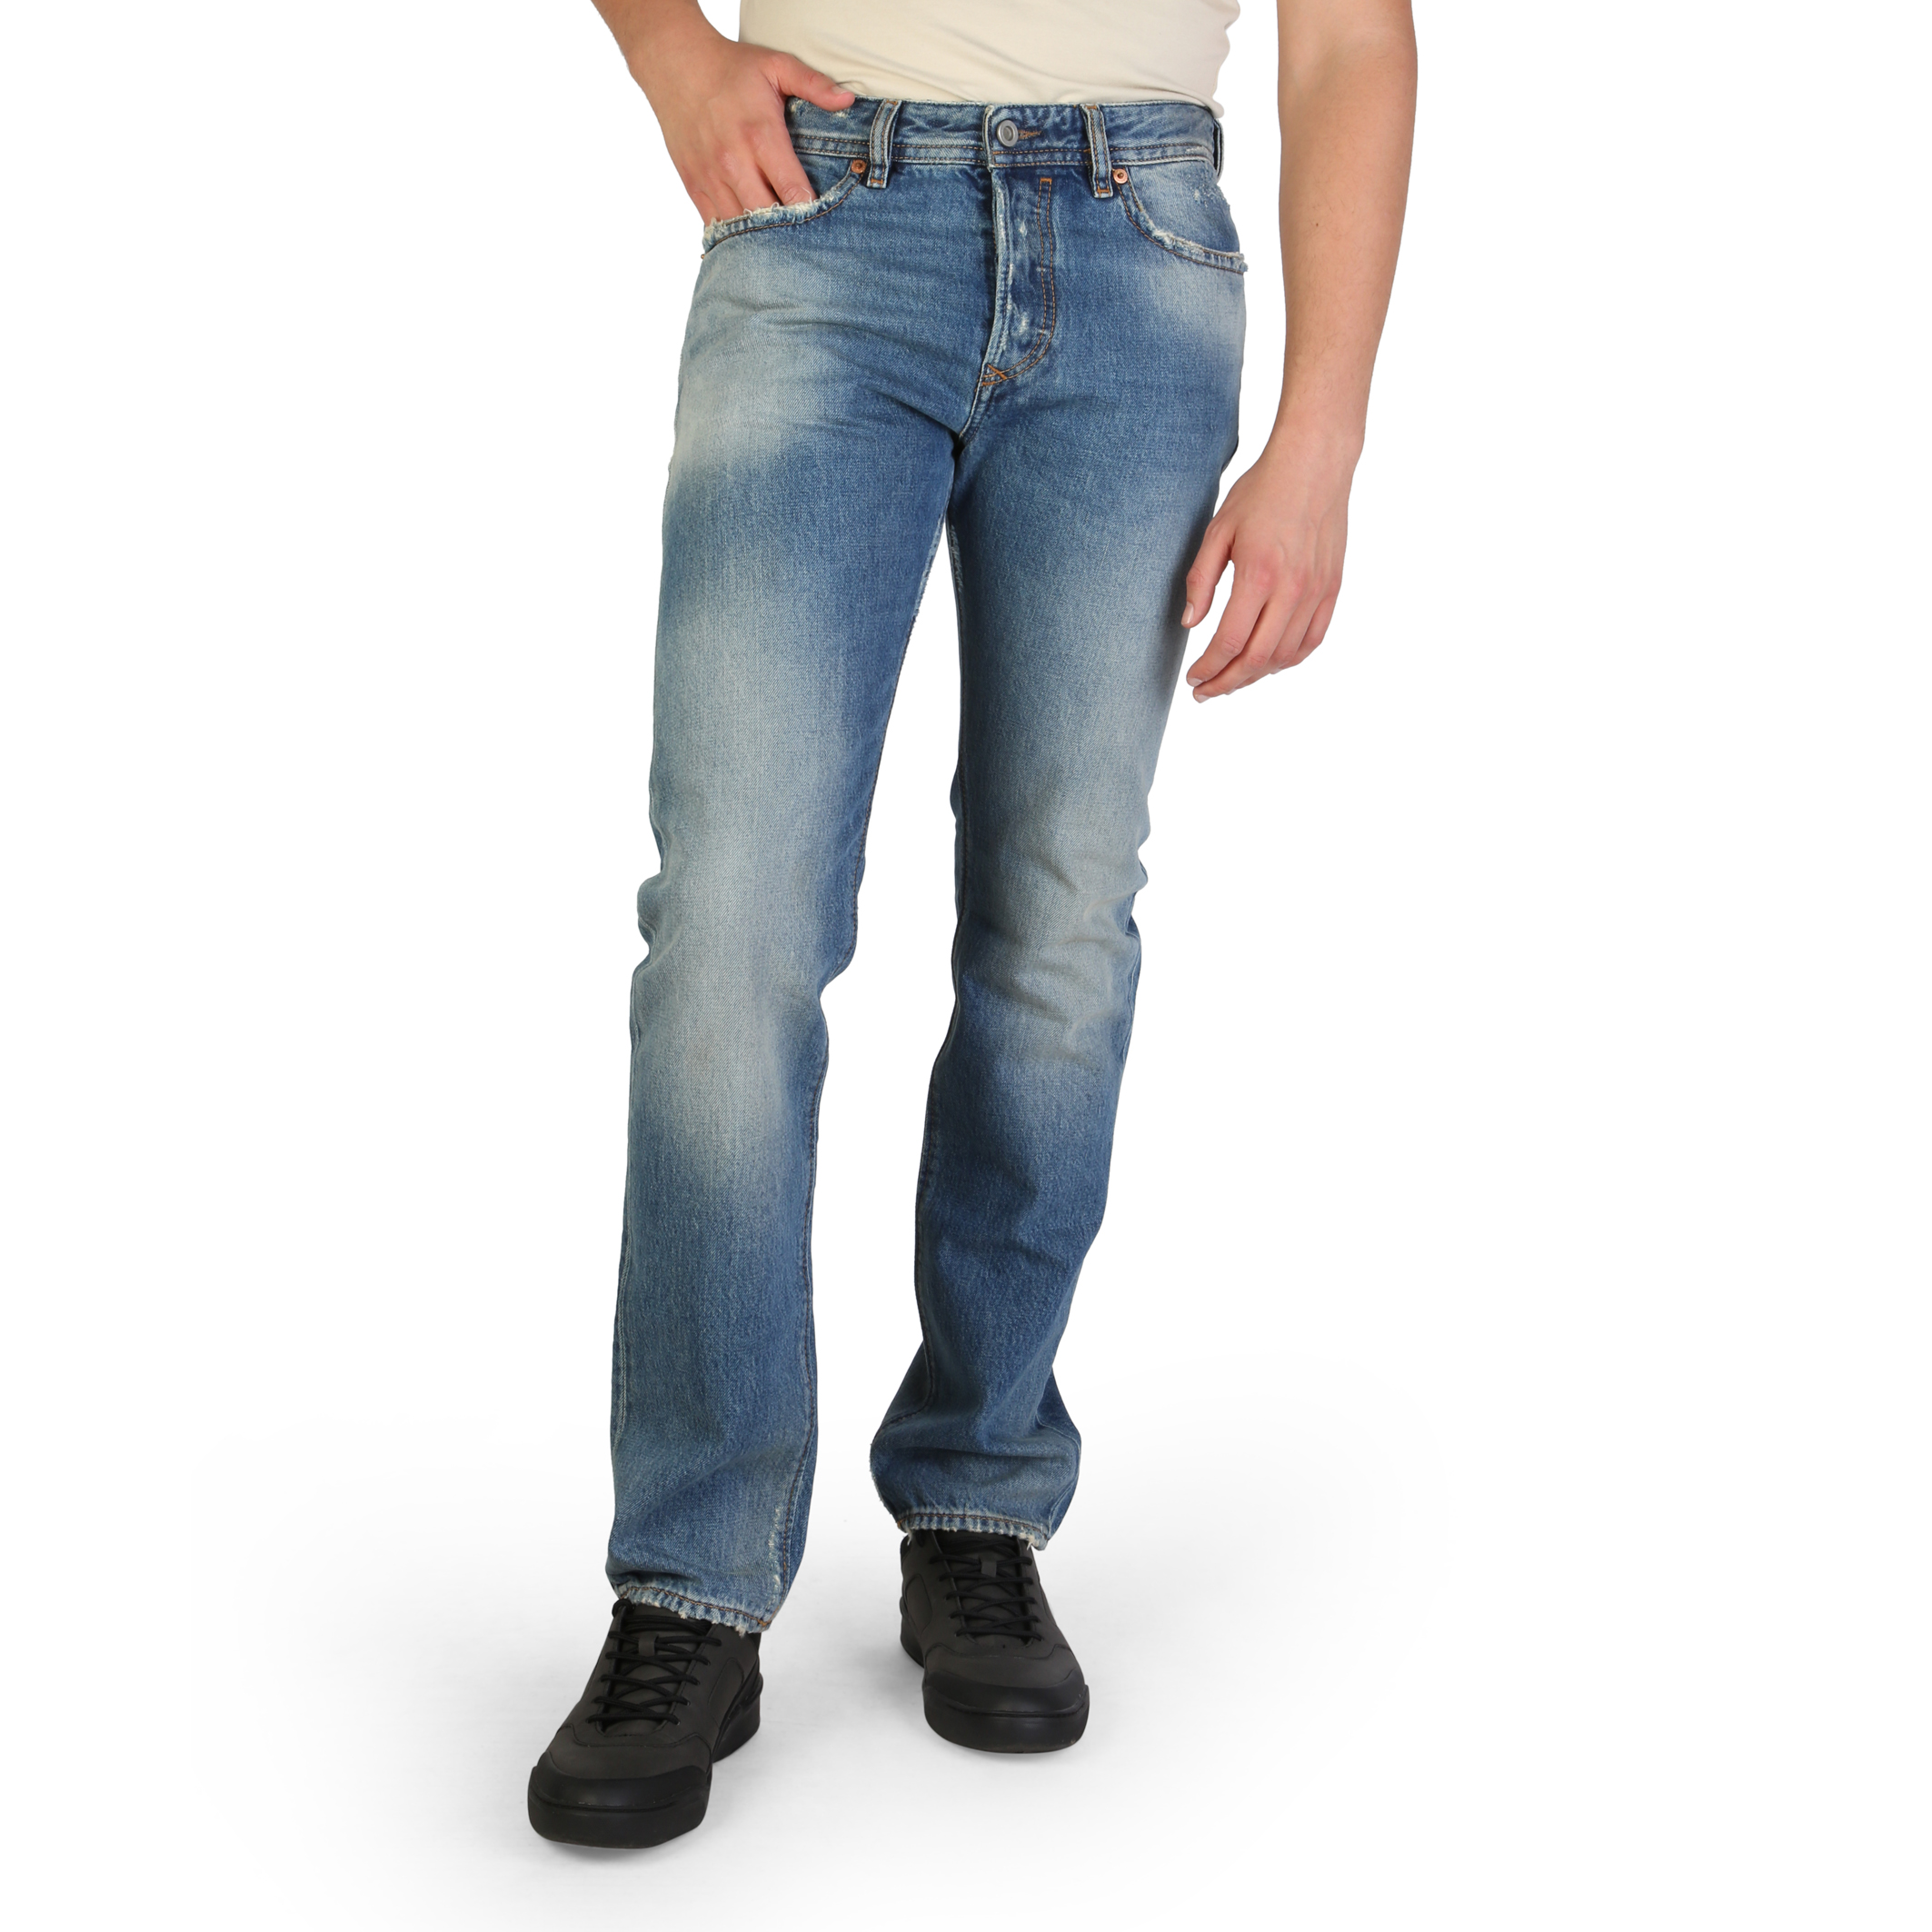 Jeans Diesel BUSTER_L32_00SDHB Uomo Blu 100045